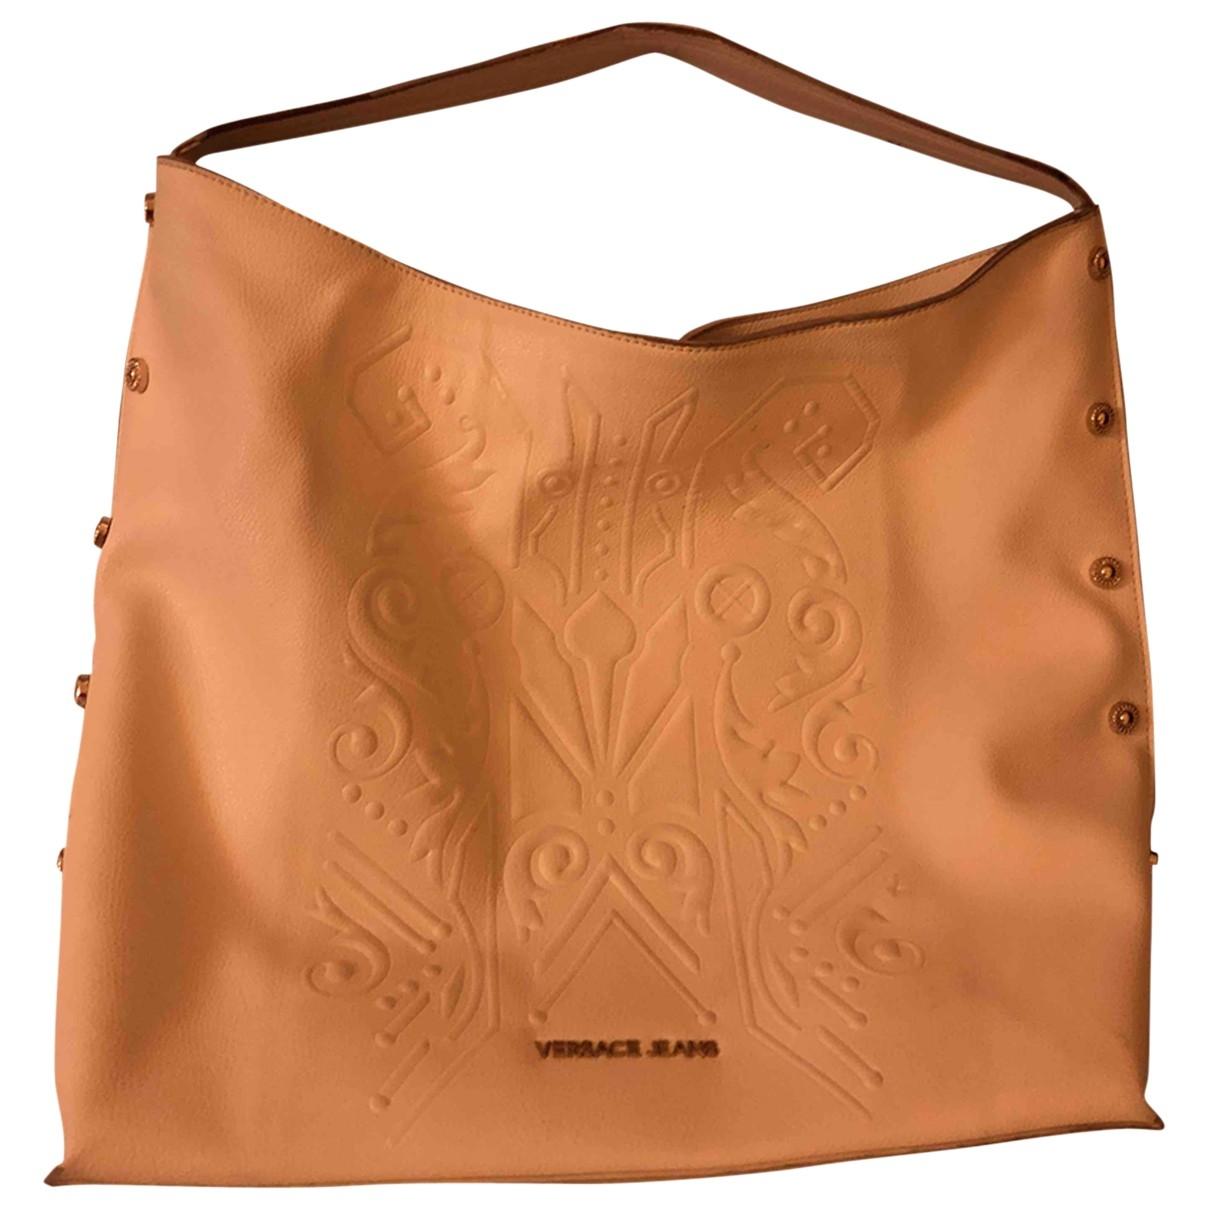 Versace Jeans \N Handtasche in  Weiss Polyester